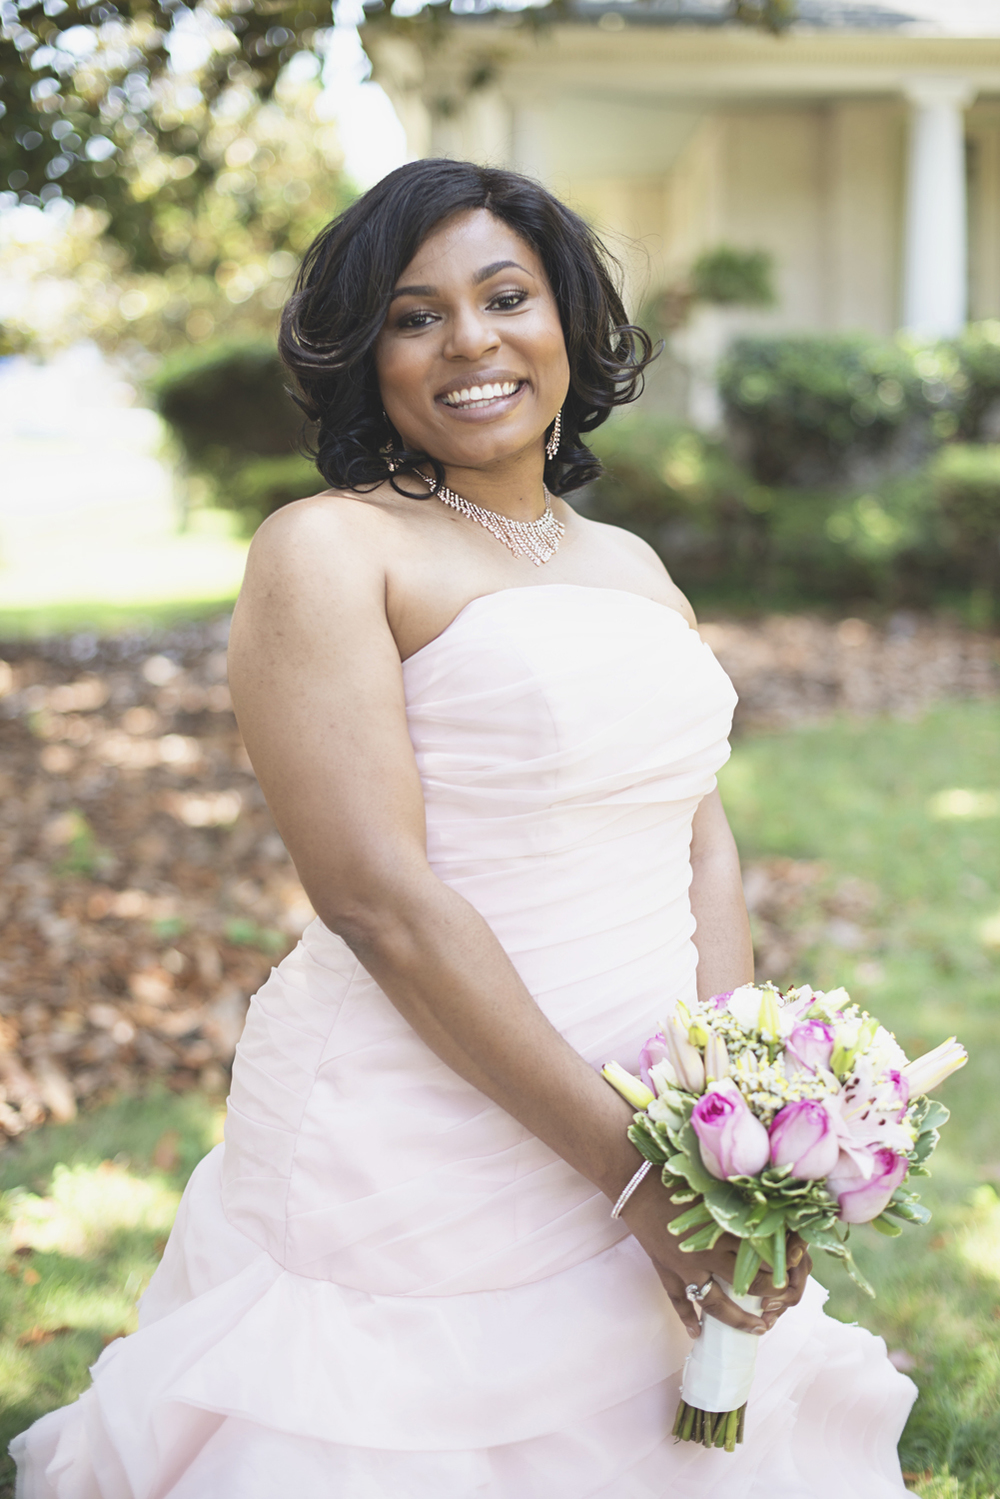 Magnolia House Inn Wedding | Hampton, Virginia Wedding | Bridal portrait | Blush pink wedding gown